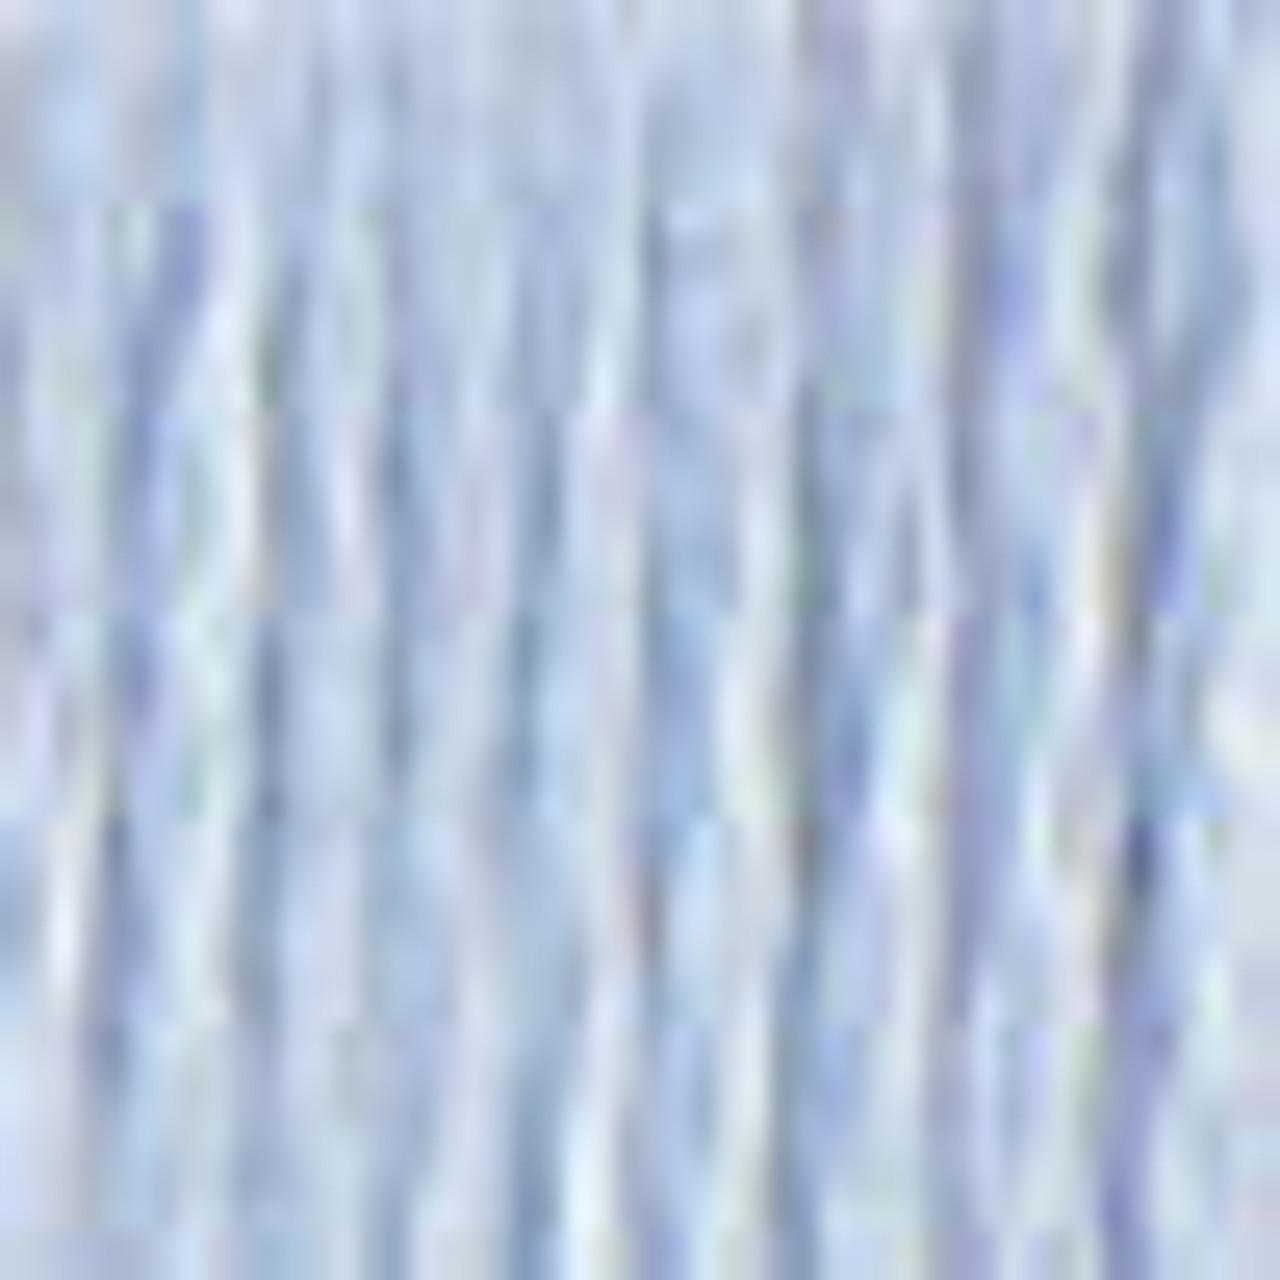 DMC # 159 Light Gray Blue Floss / Thread